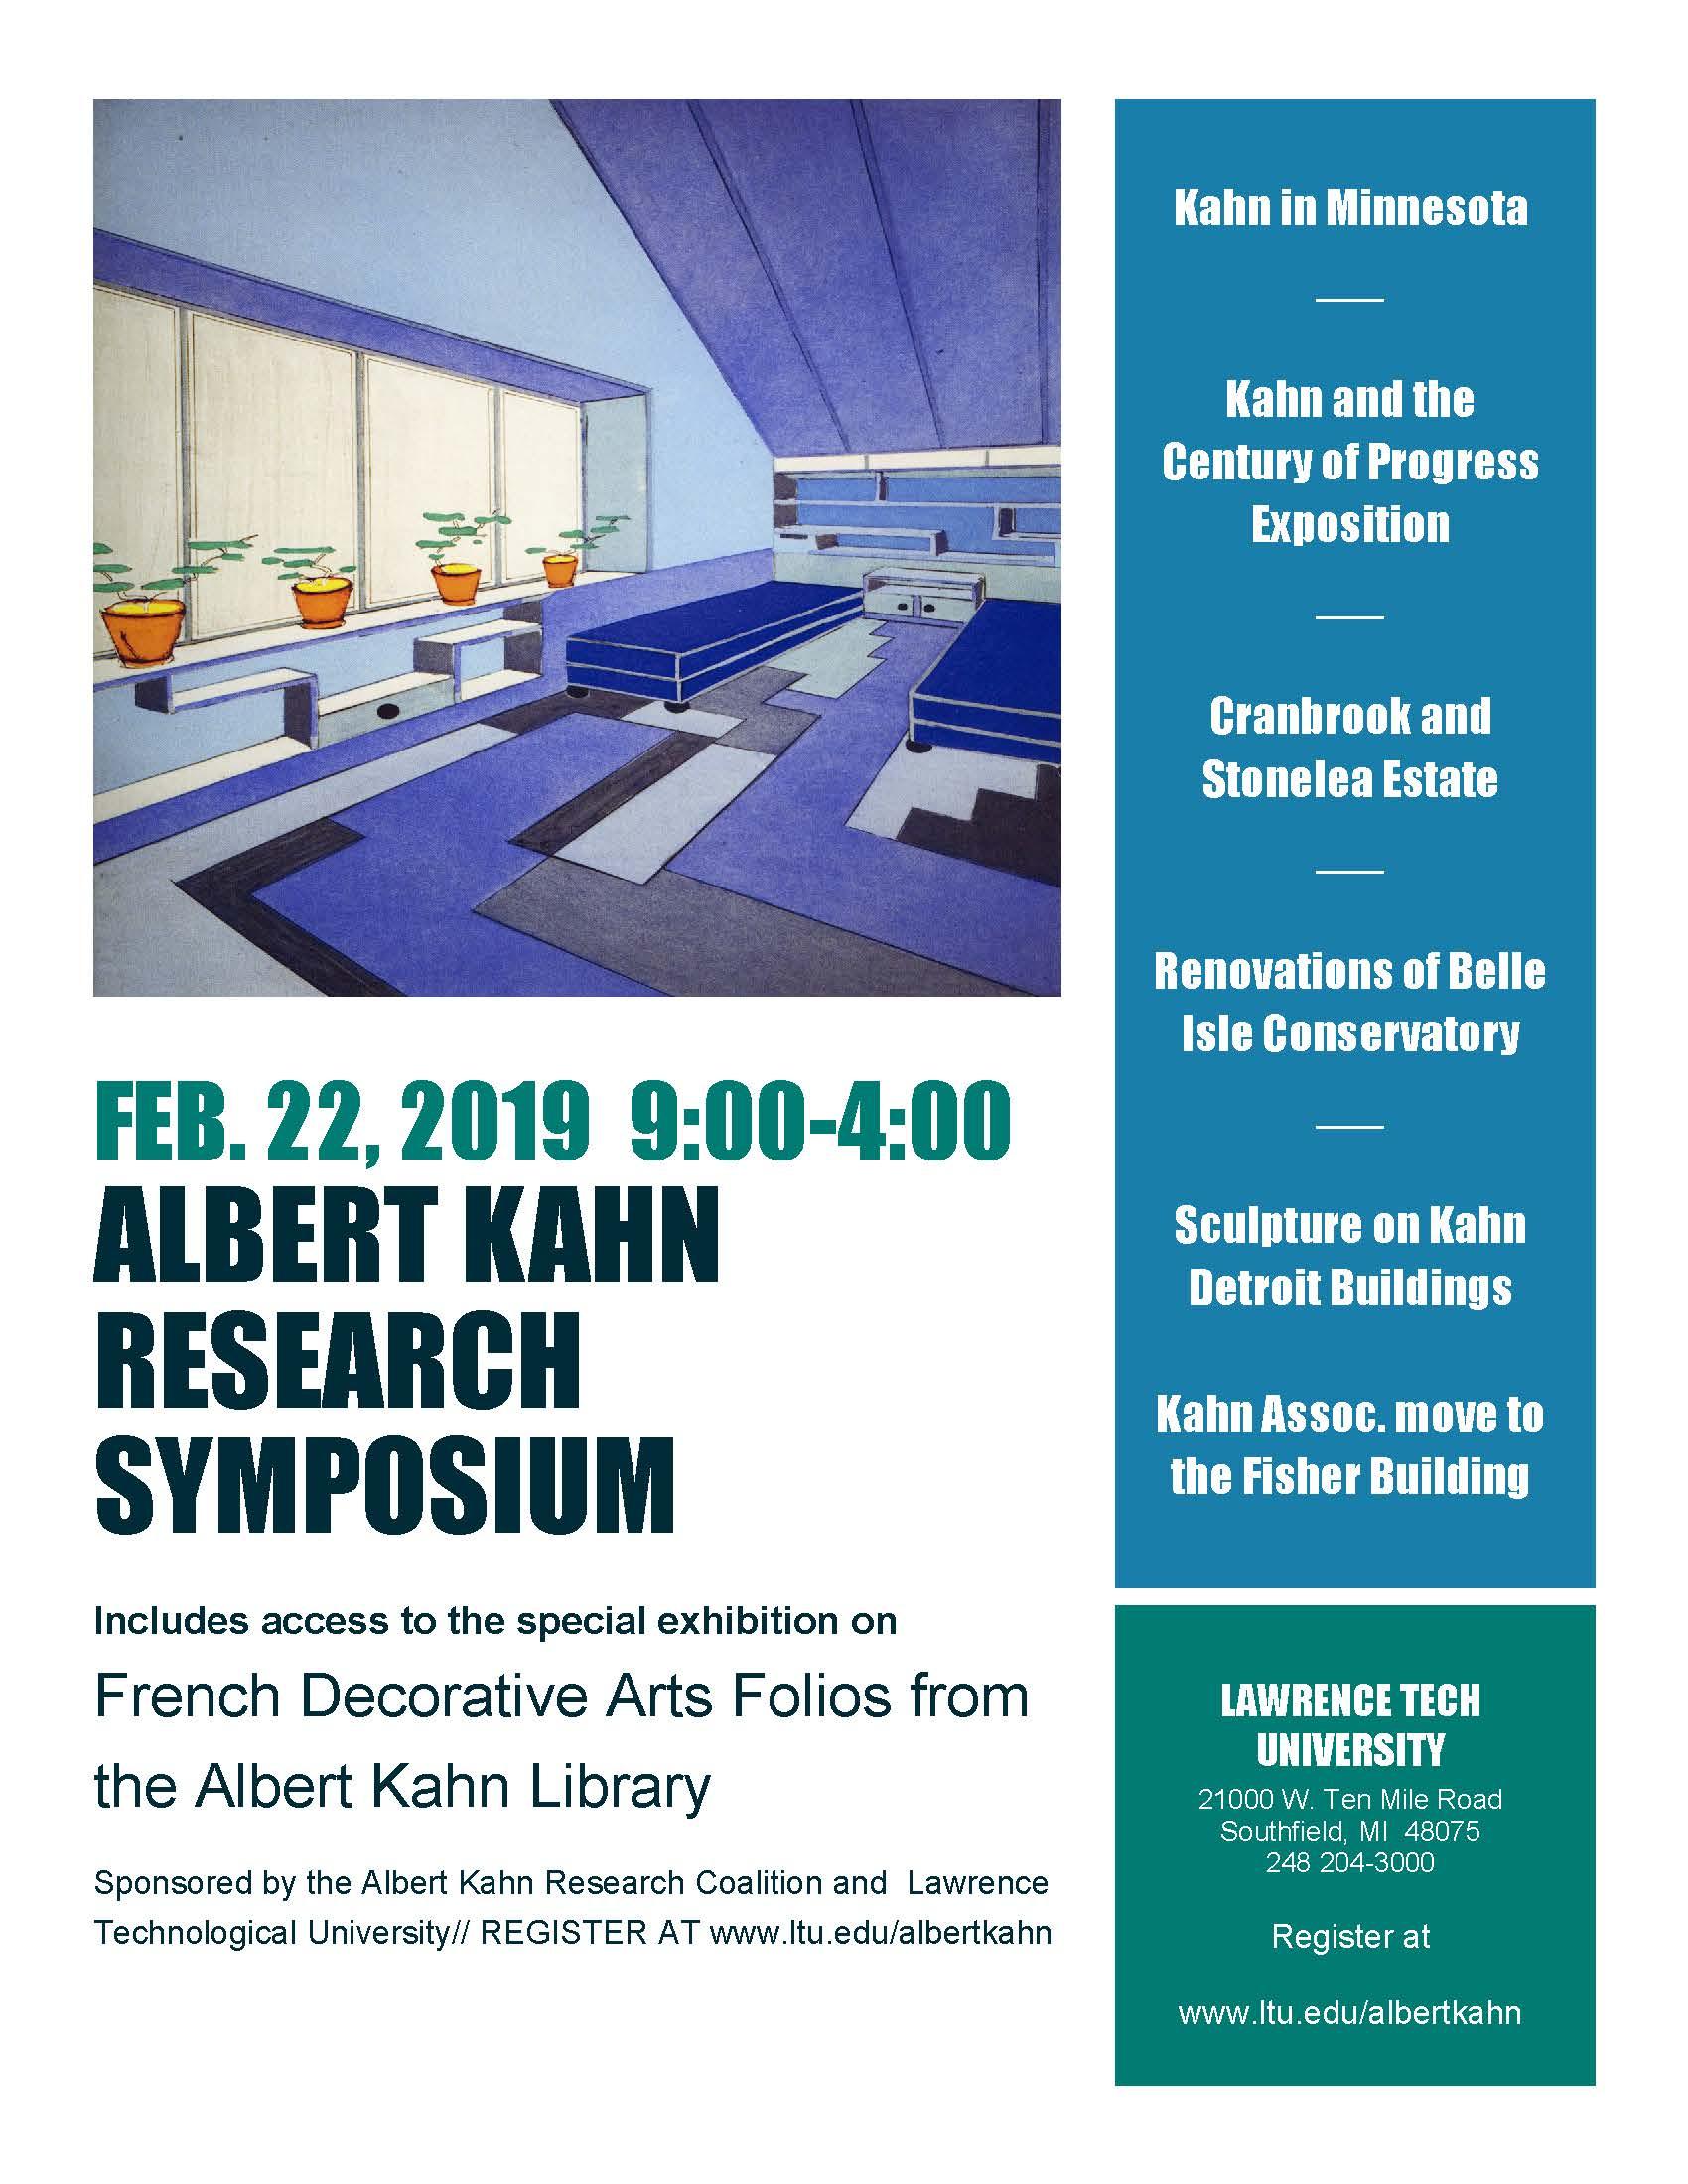 Albert Kahn Research Symposium 2019